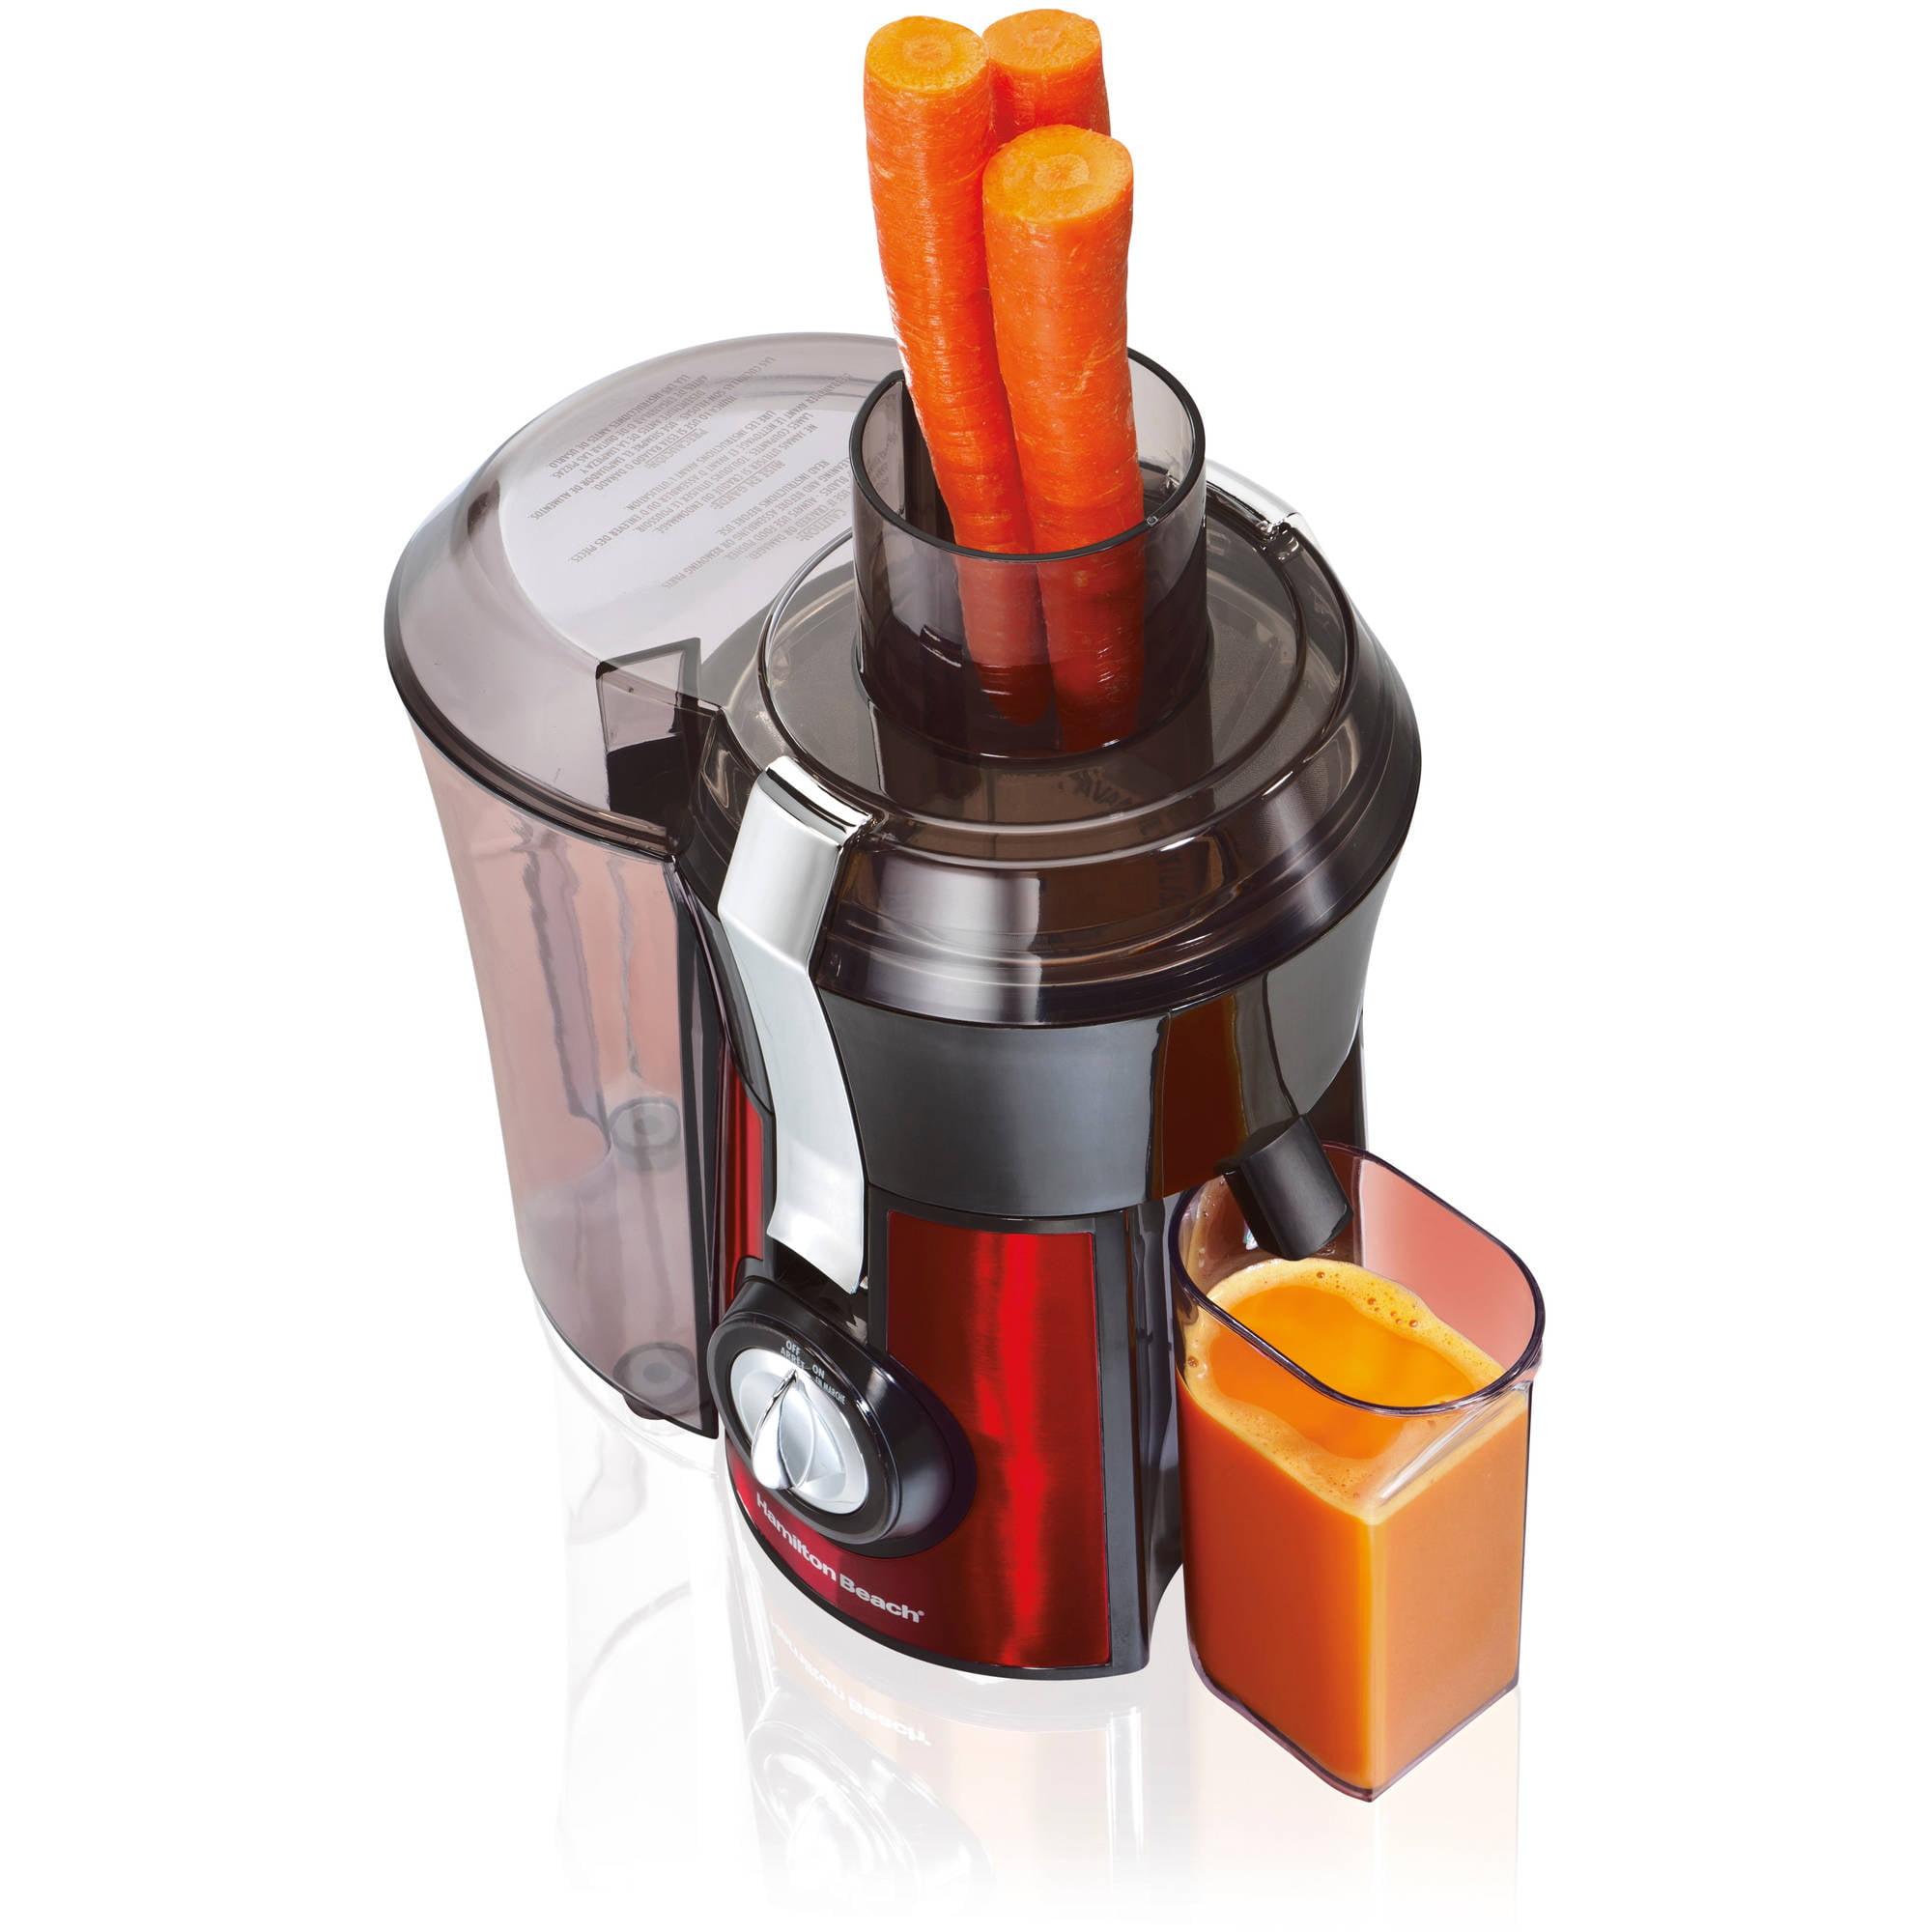 Hamilton Beach Big Mouth Juice Extractor | Model# 67606-MX